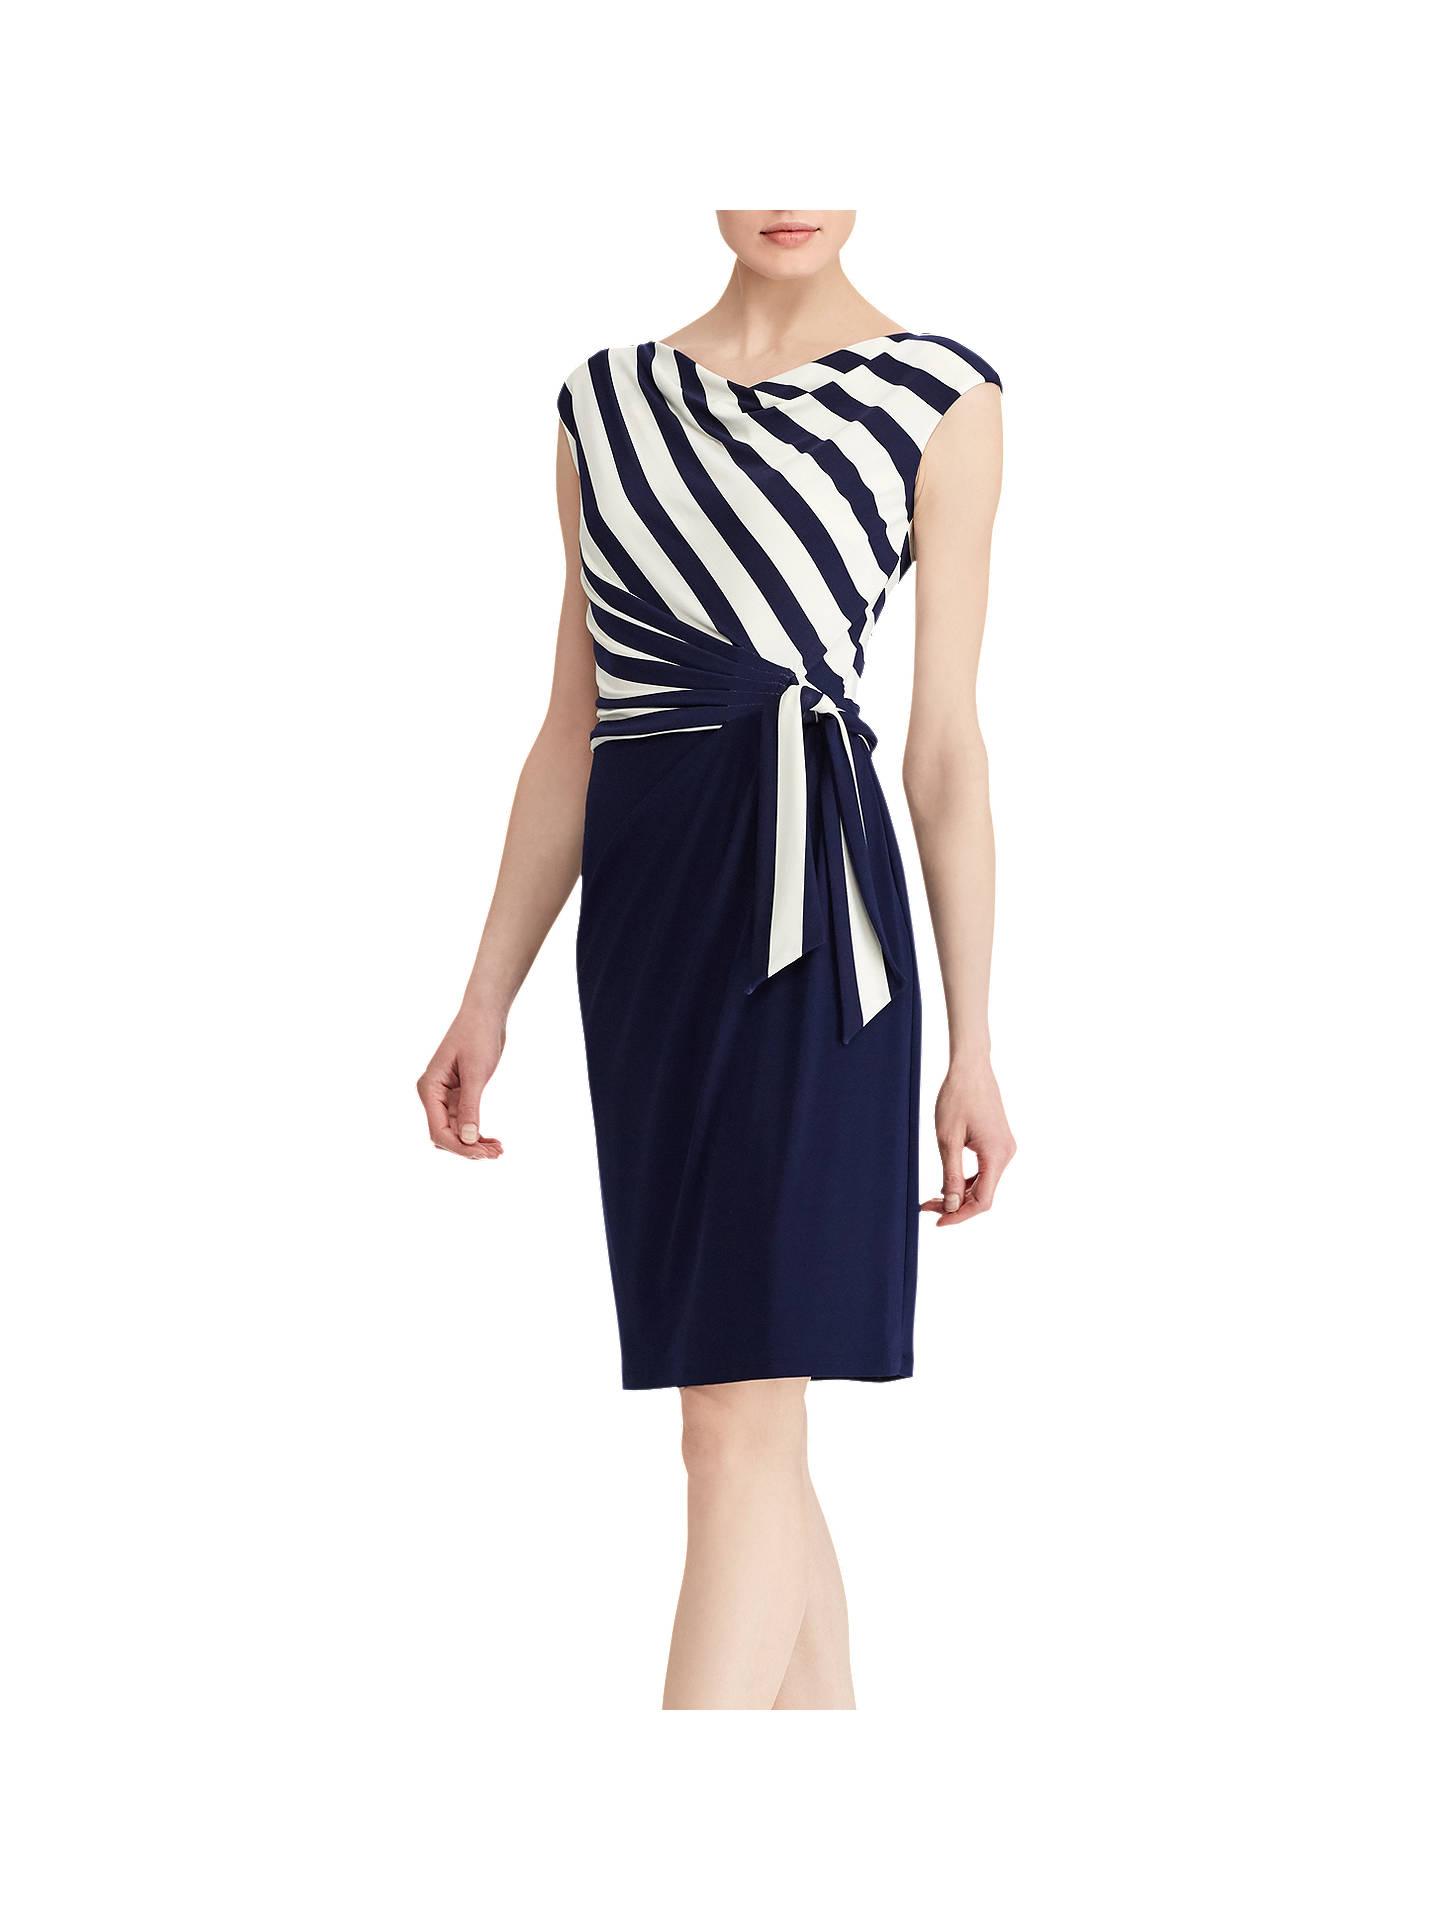 Lauren Ralph Sadira Cap Sleeve Day Dress Navy White 6 Online At